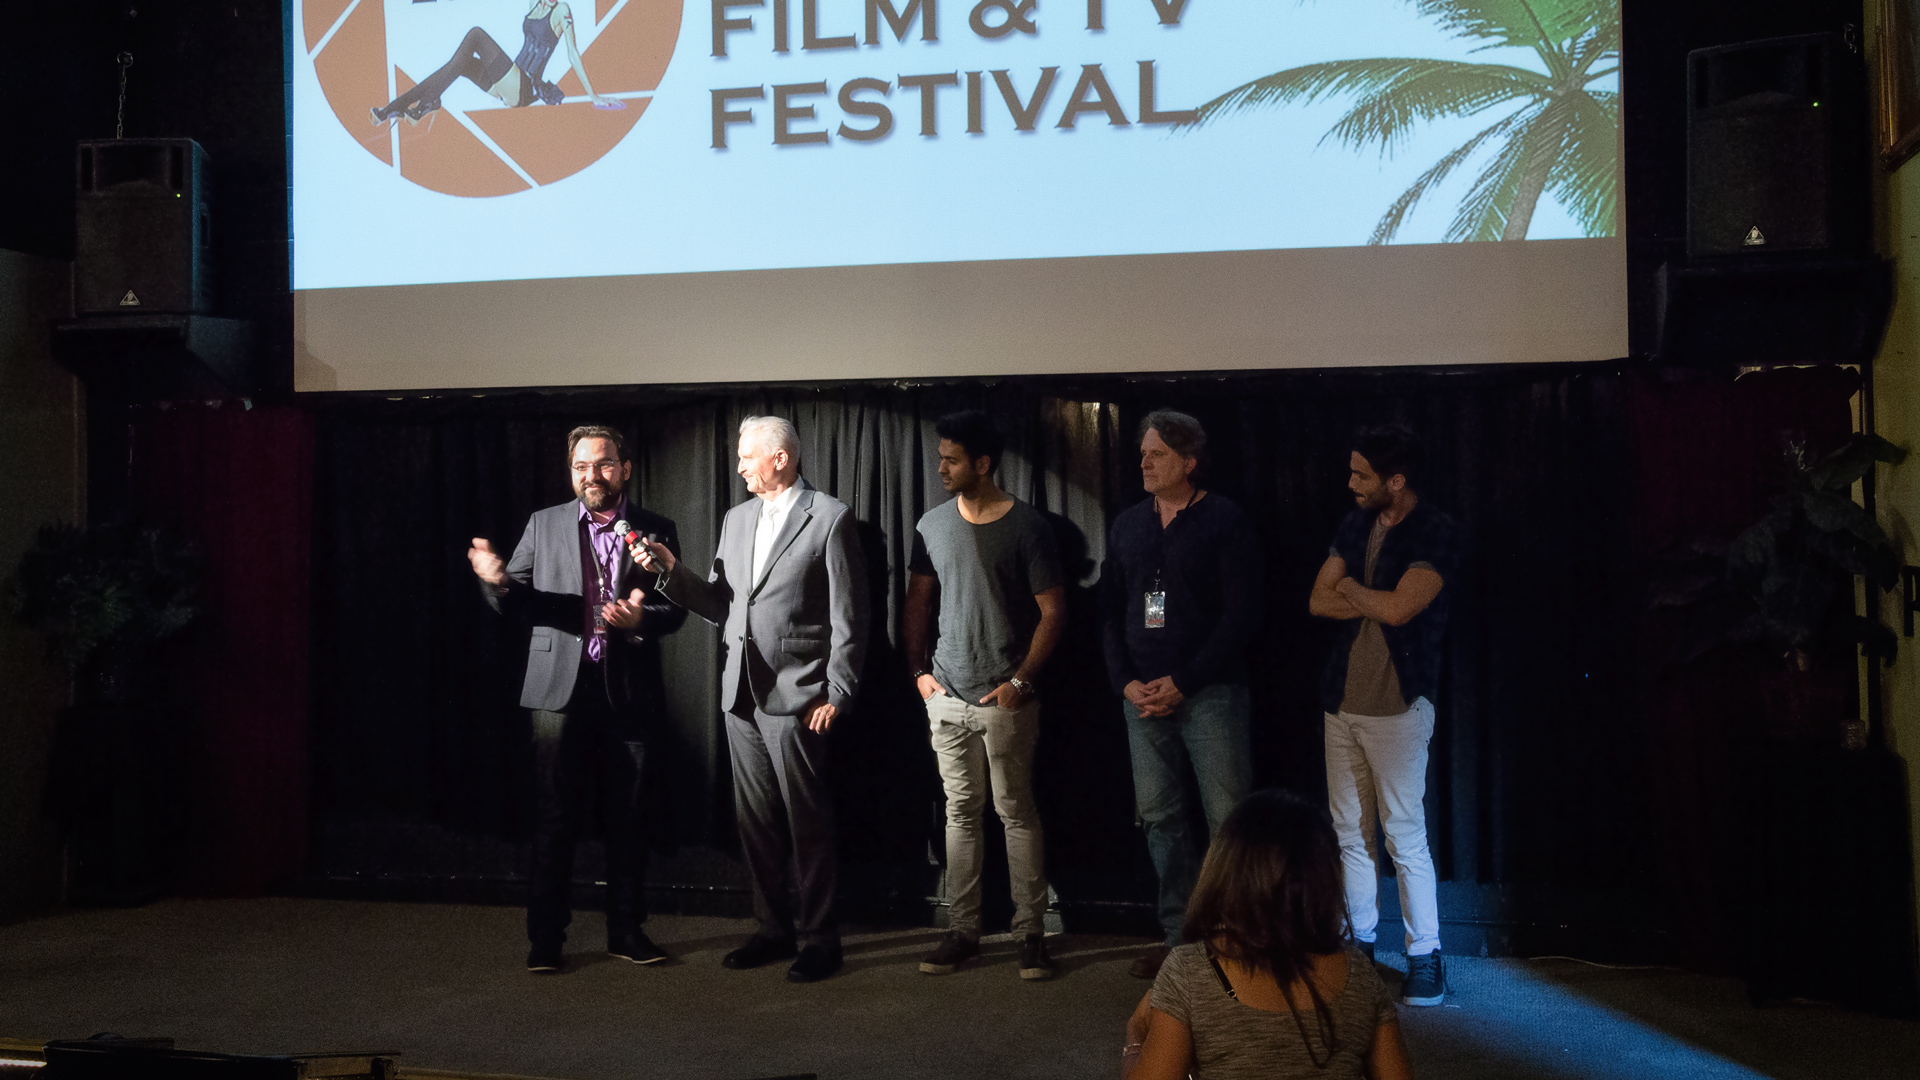 Studio City Intl Film Festival